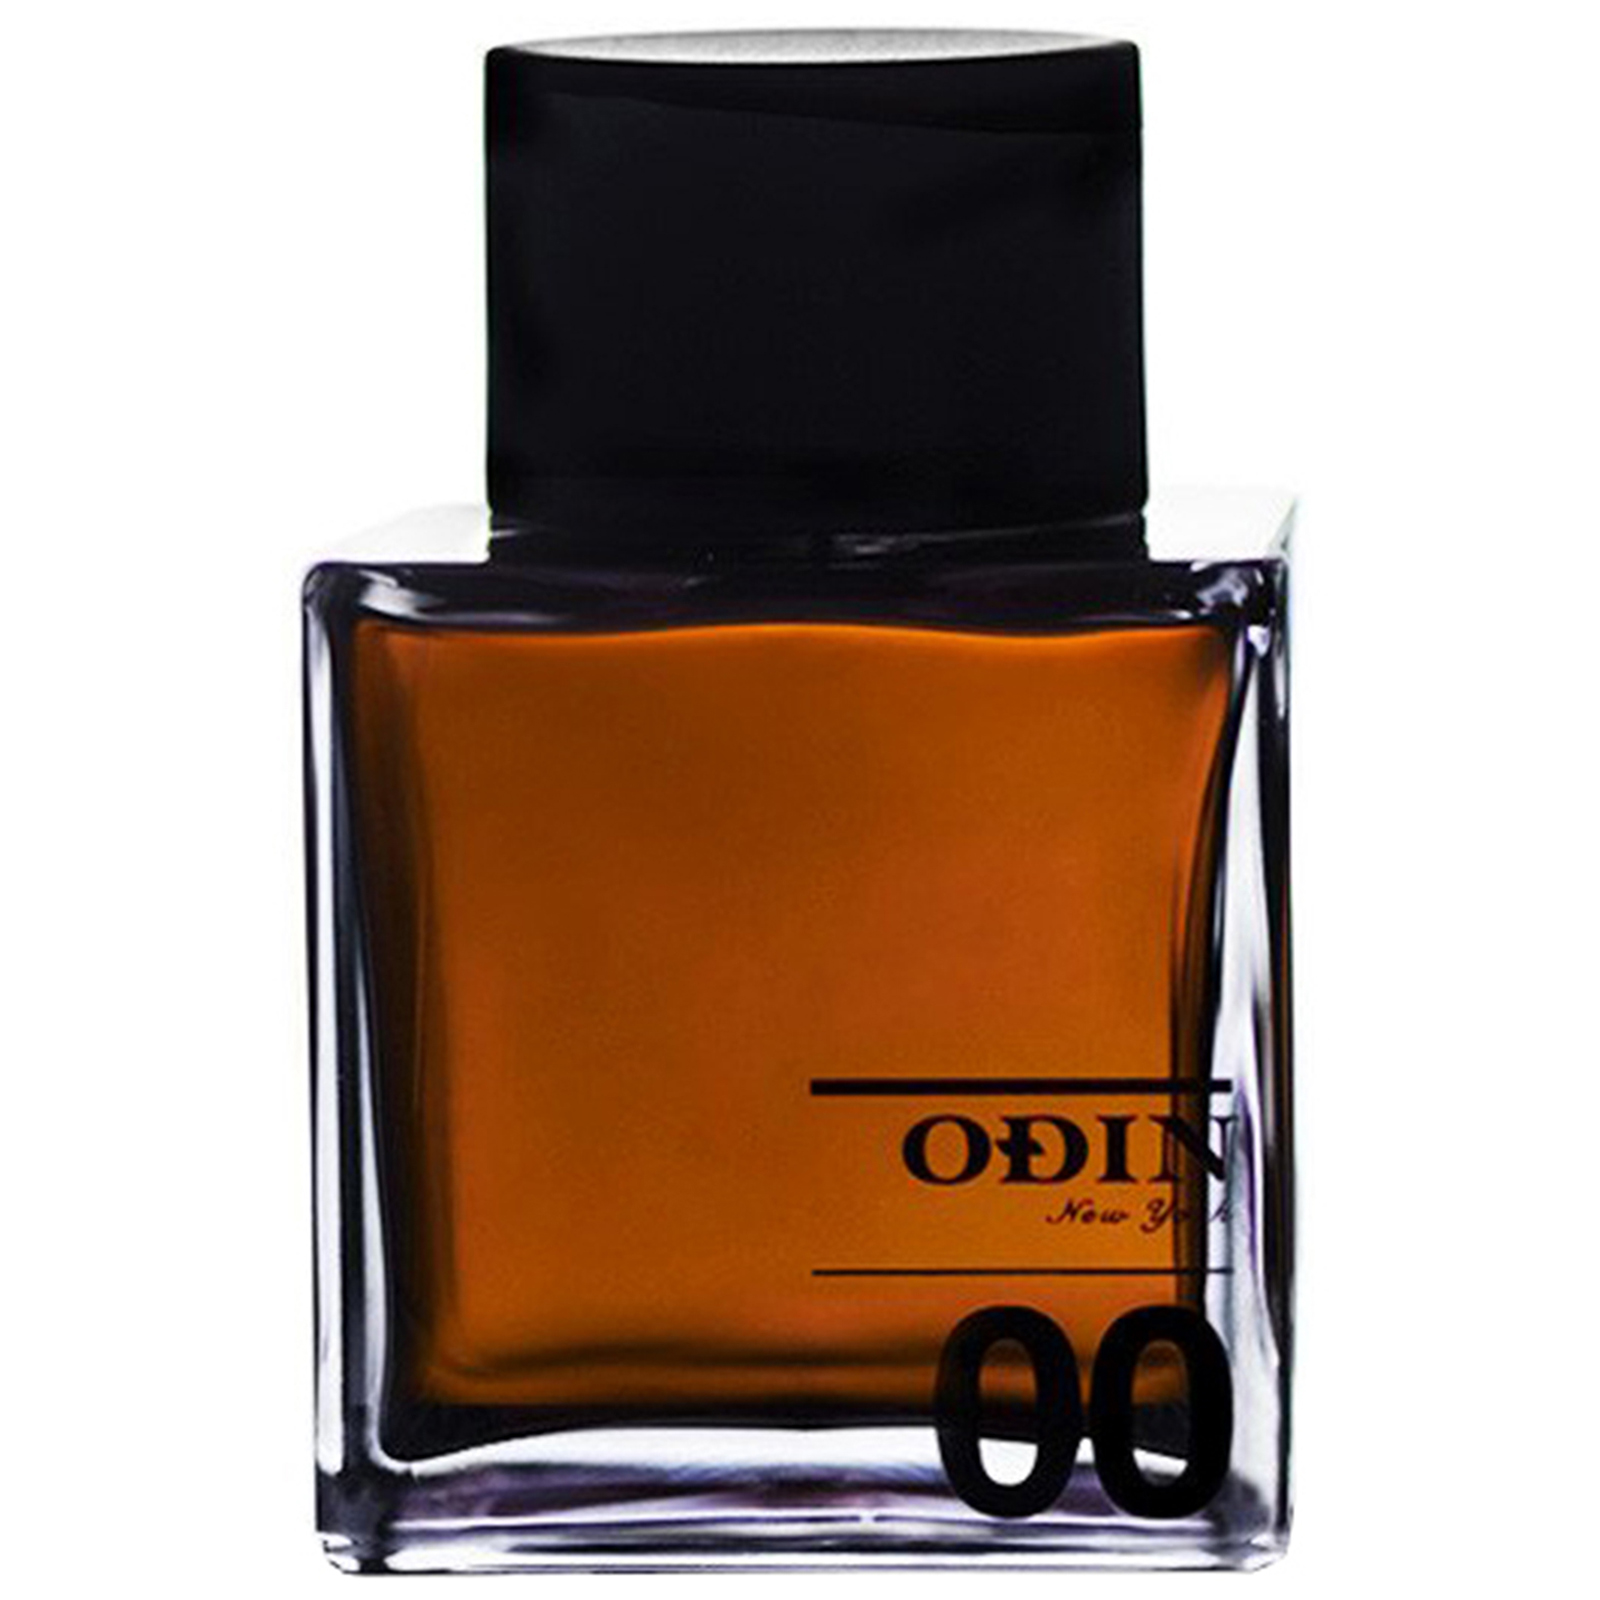 00 aurel profumo eau de parfum 100 ml